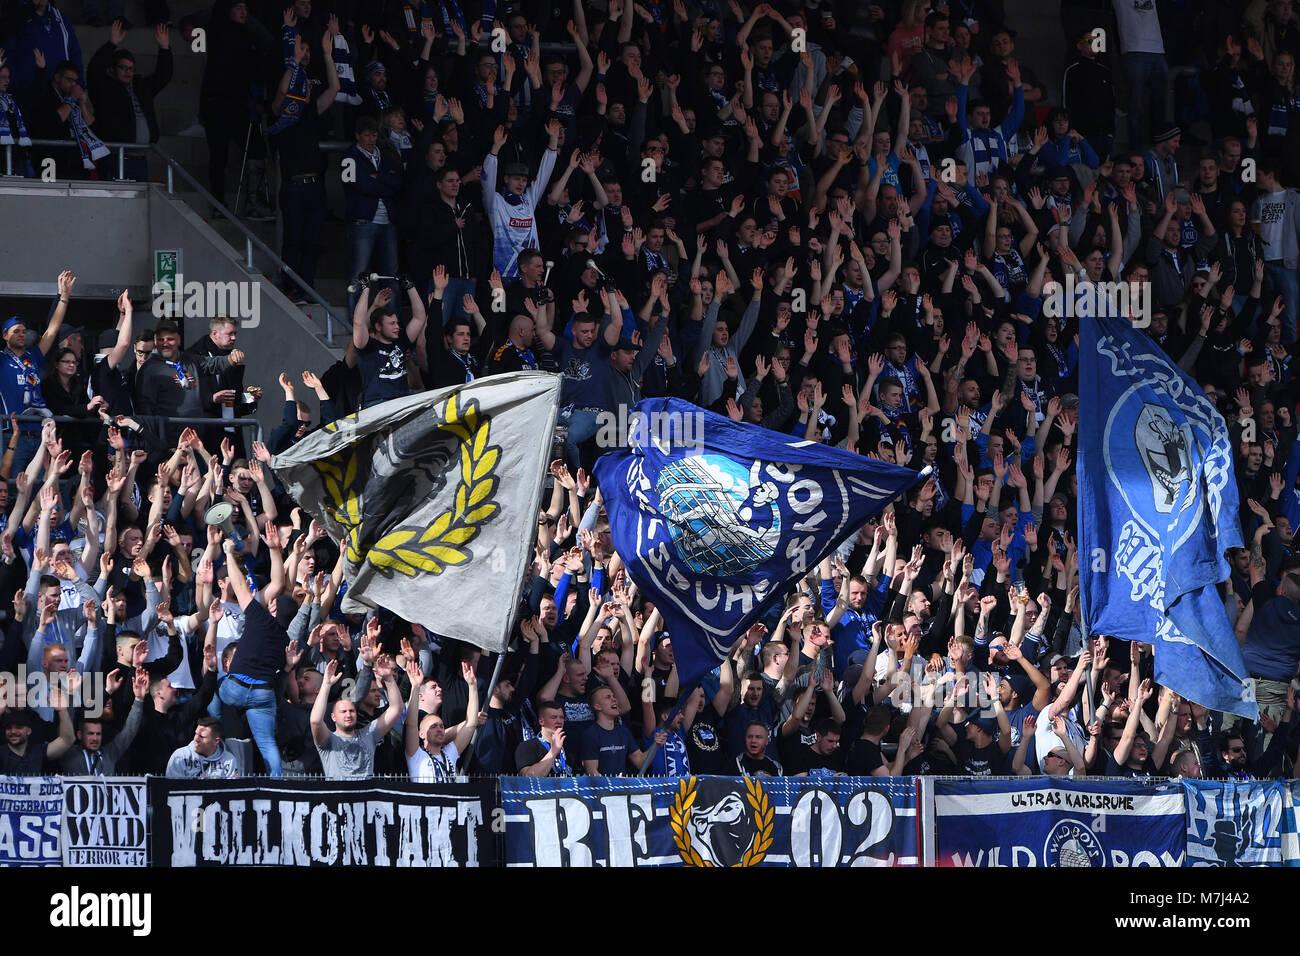 Erfurt, Deutschland. 11th Mar, 2018. KSC Fans. GES/ Fussball/ 3. Liga: RW Erfurt - Karlsruher SC, 11.03.2018 Football/Soccer: - Stock Image